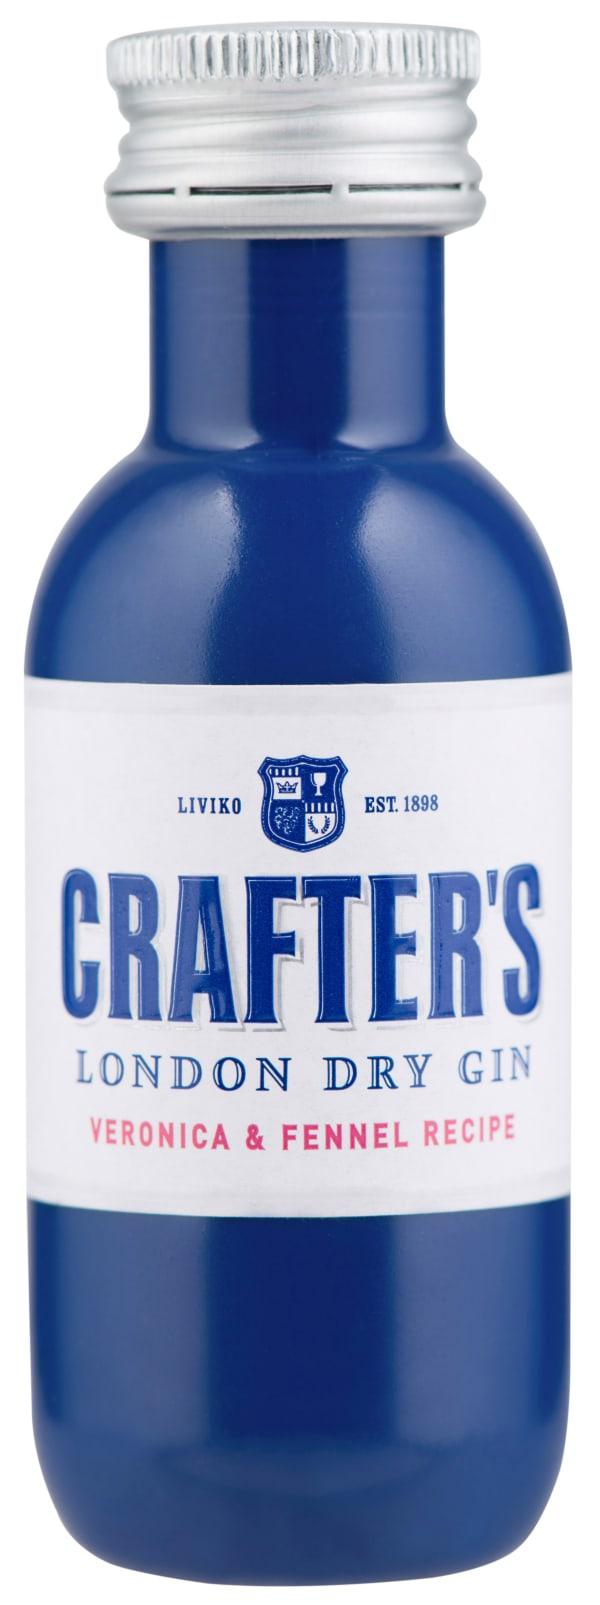 Crafter's London Dry Gin plastflaska